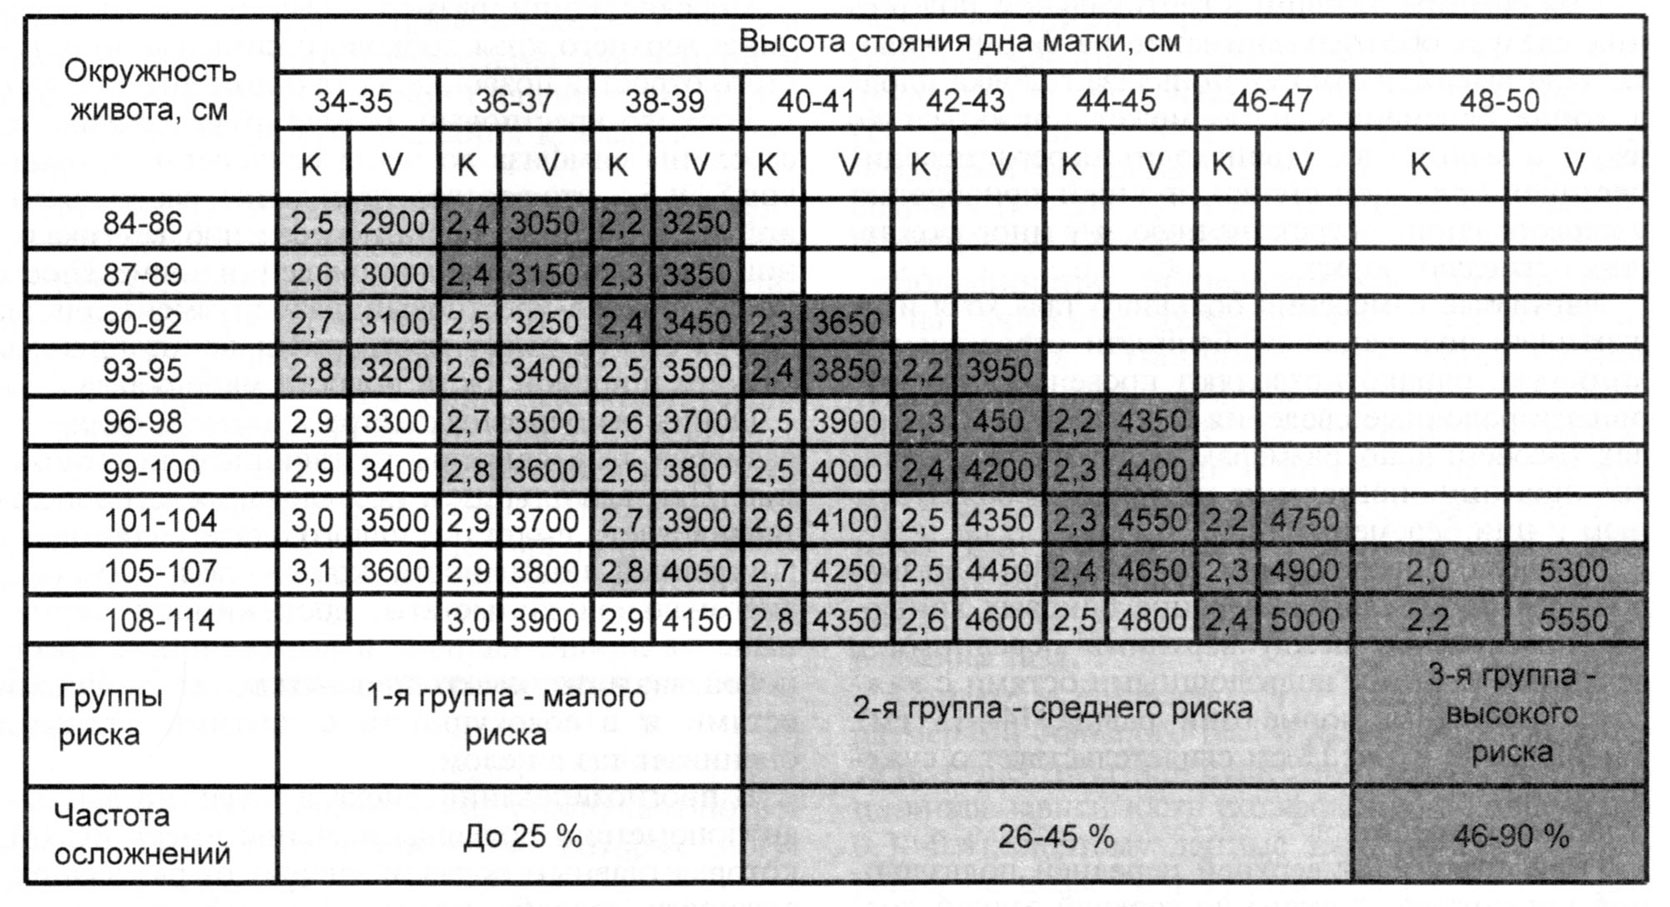 Фетометрия плода: таблица по неделям, нормы, расшифровка показателей (дб, ог, ож, иаж, сдж, мрм, пвп, вдм), показания, подготовка, цена